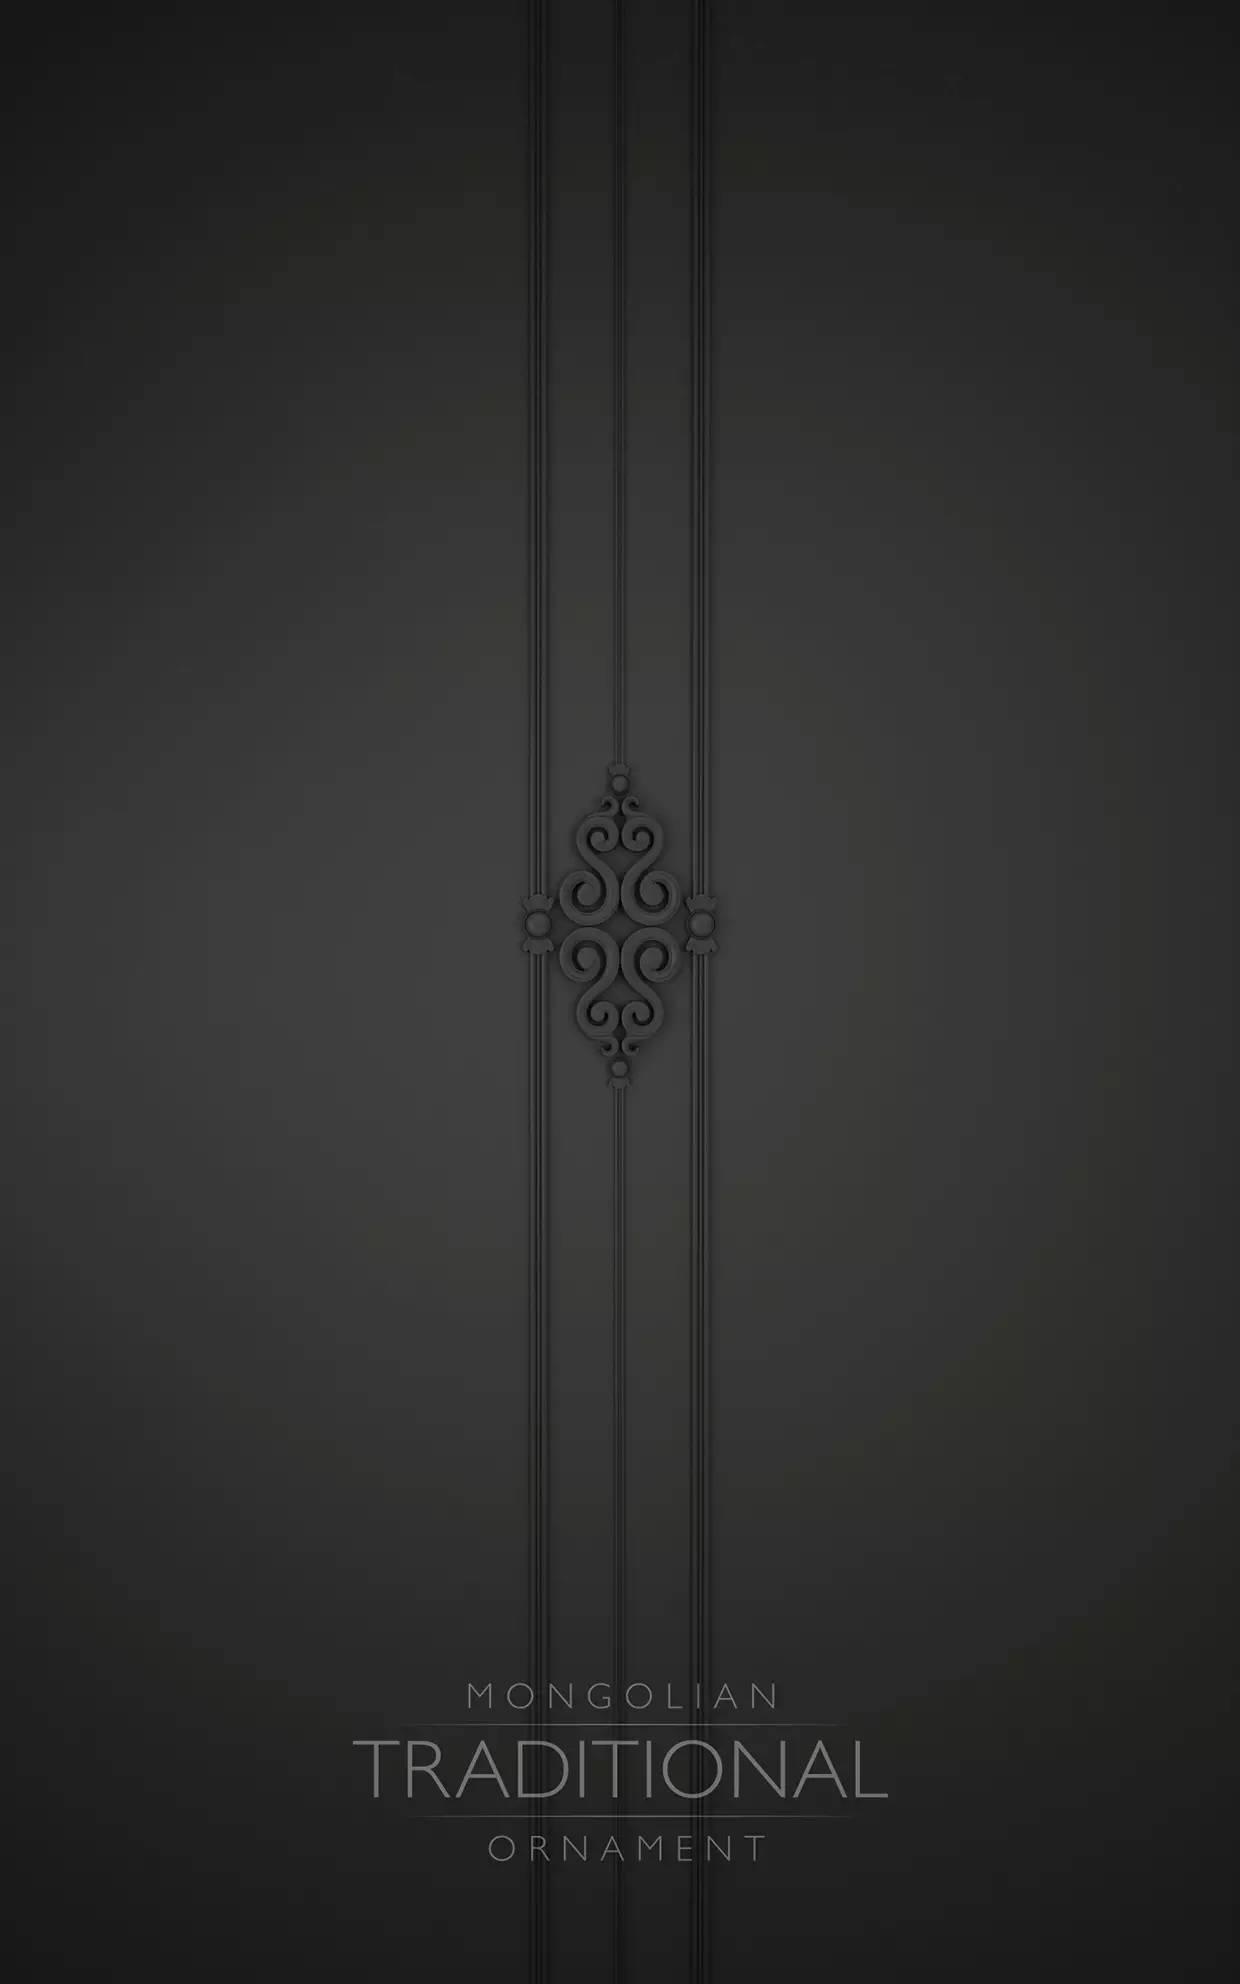 室内设计|蒙族传统装饰(Mongolian Traditional Ornament) 第7张